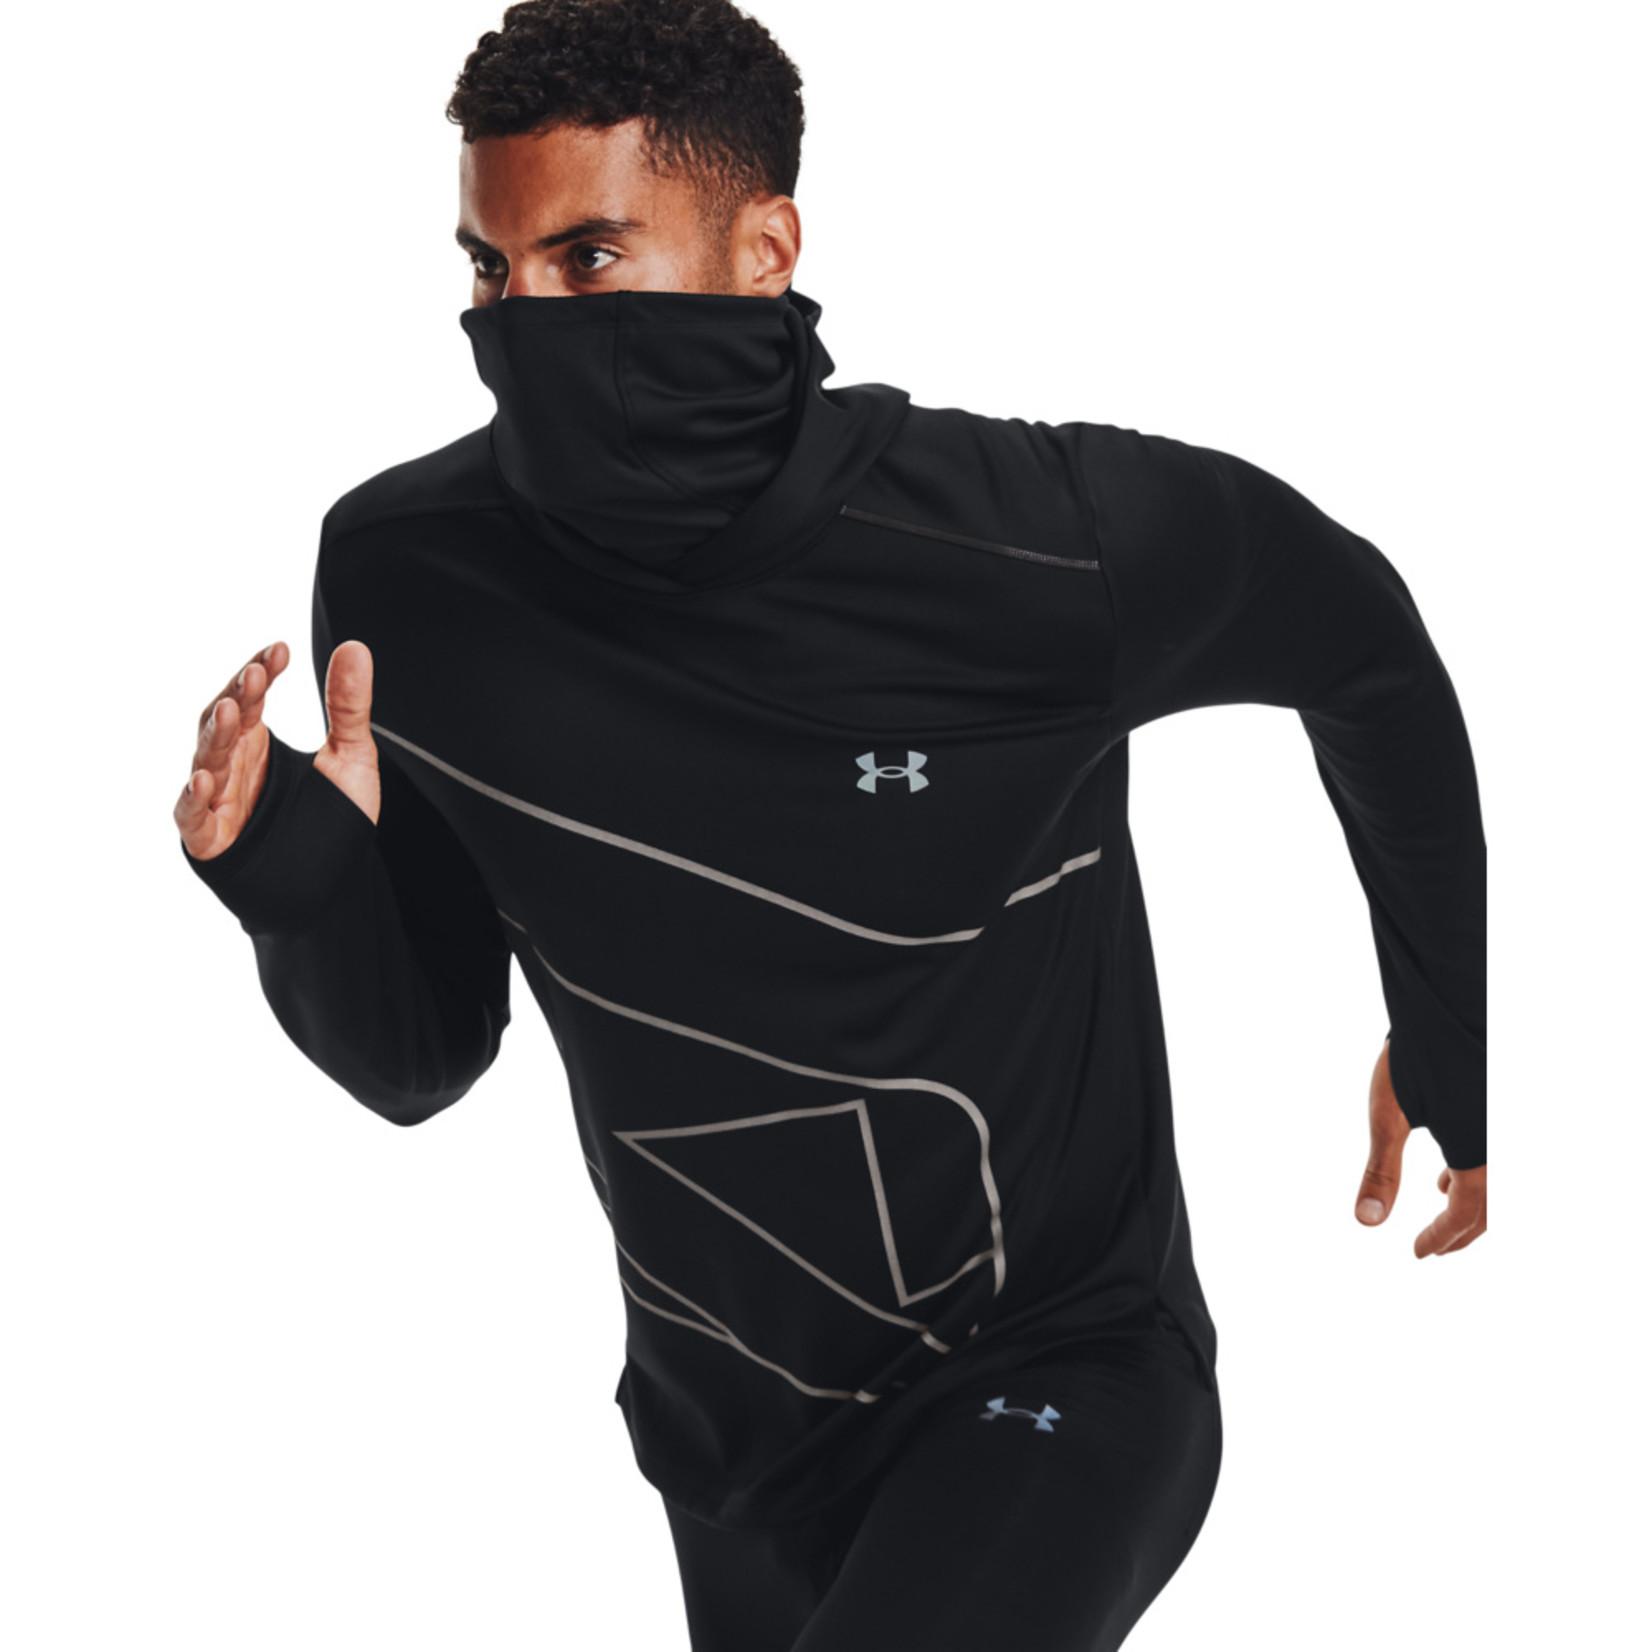 Under Armour UA Empowered Hoodie-Black